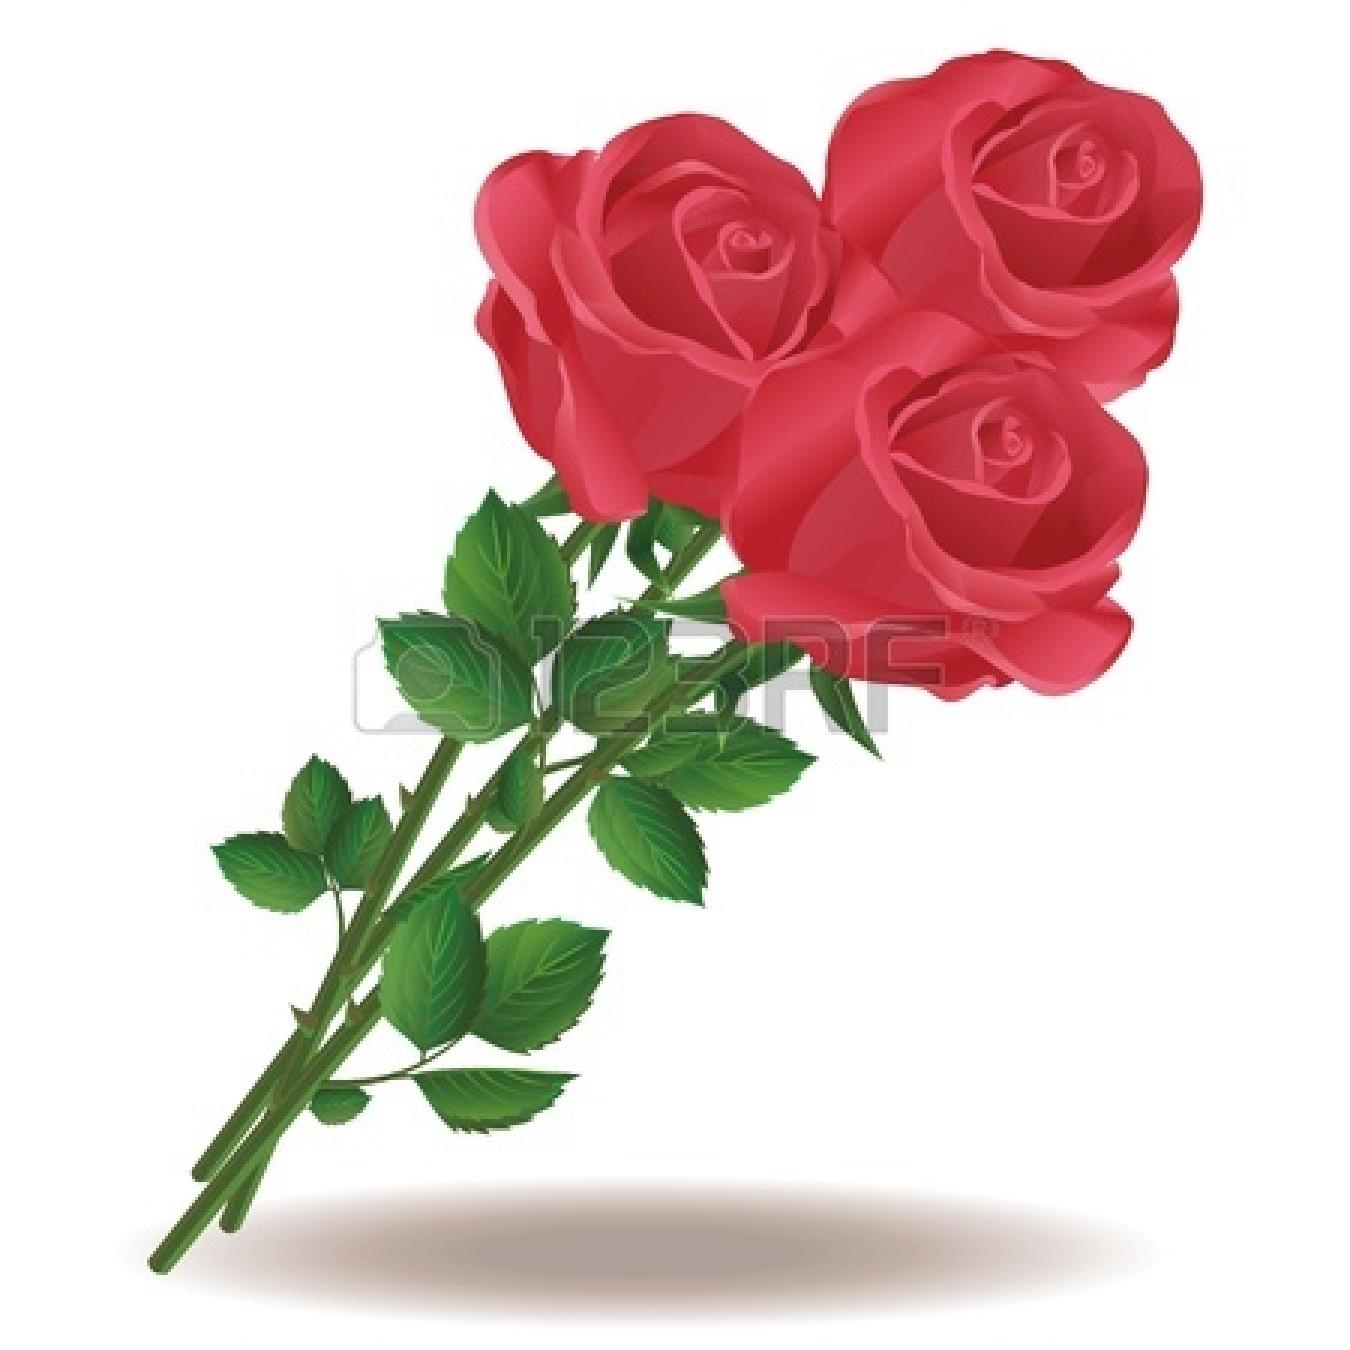 Clipart roses bucket. Rose bouquet clip art